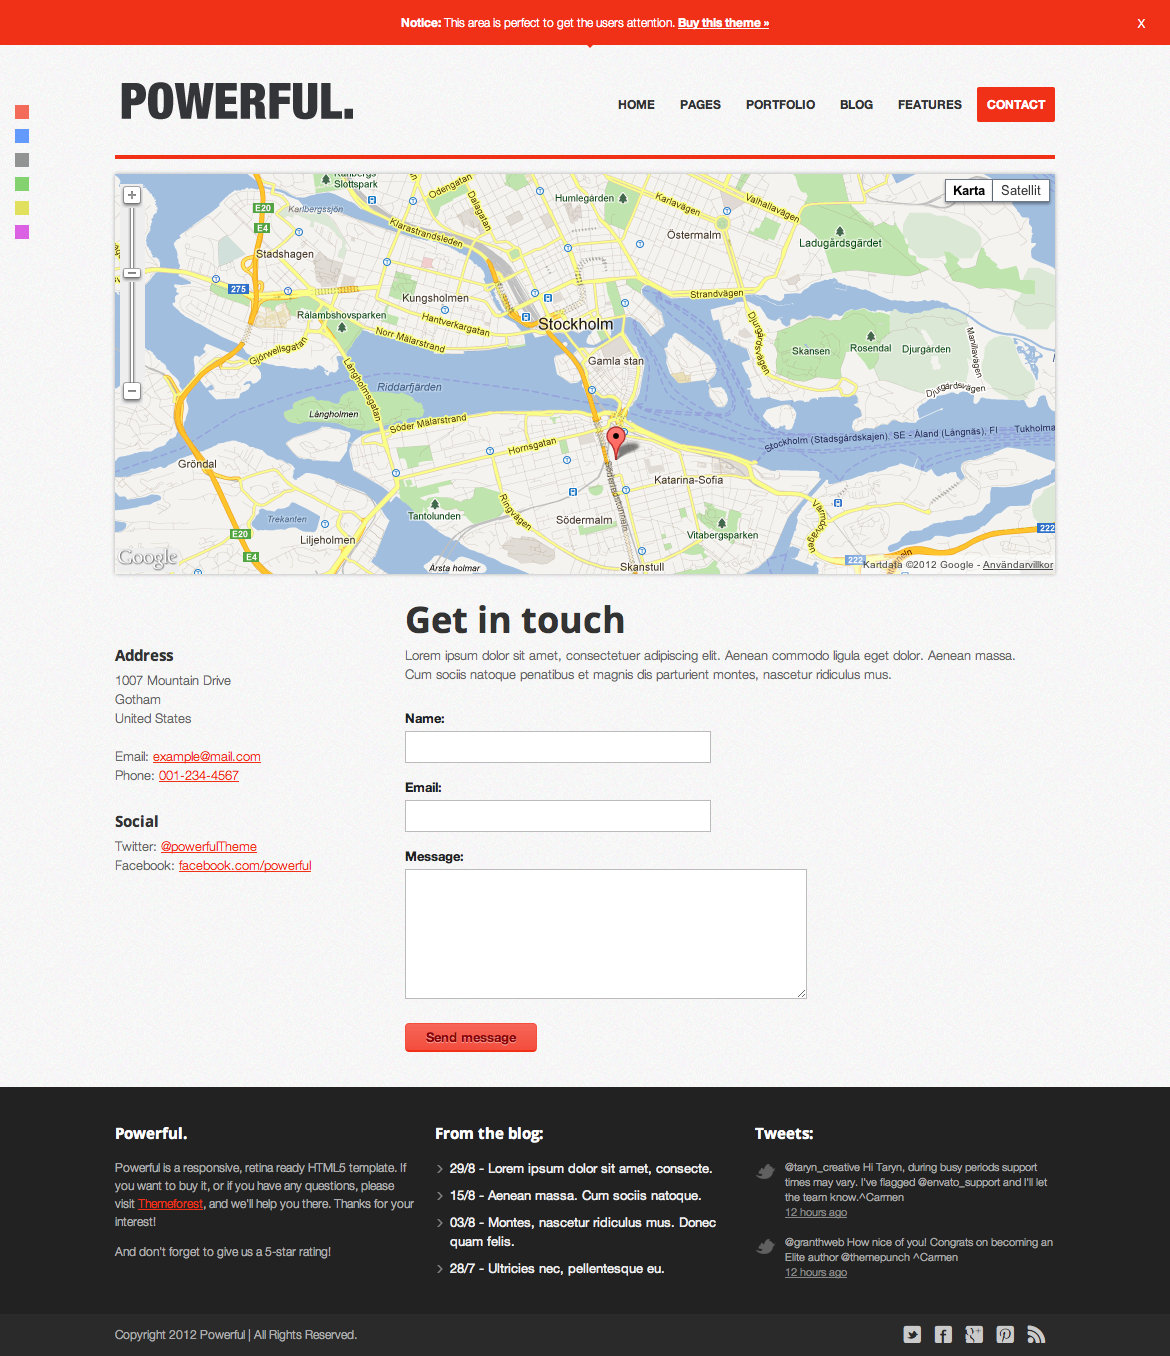 Powerful - Responsive, Retina-ready HTML5 template